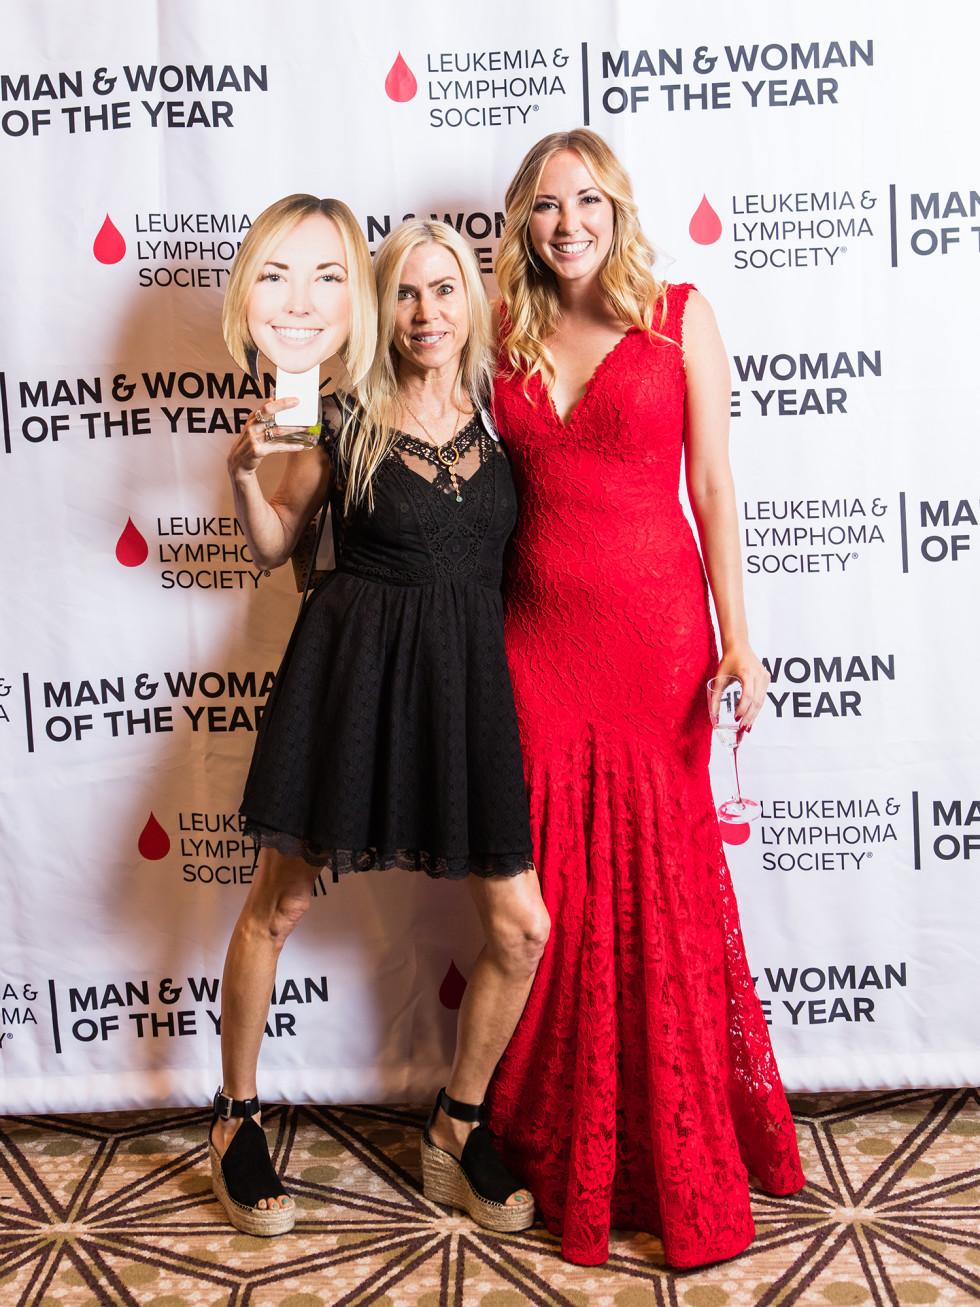 Leukemia & Lymphoma Society's Man and Woman of the Year Grand Finale Gala 2017 Leah Lee Kelsy Kuehn